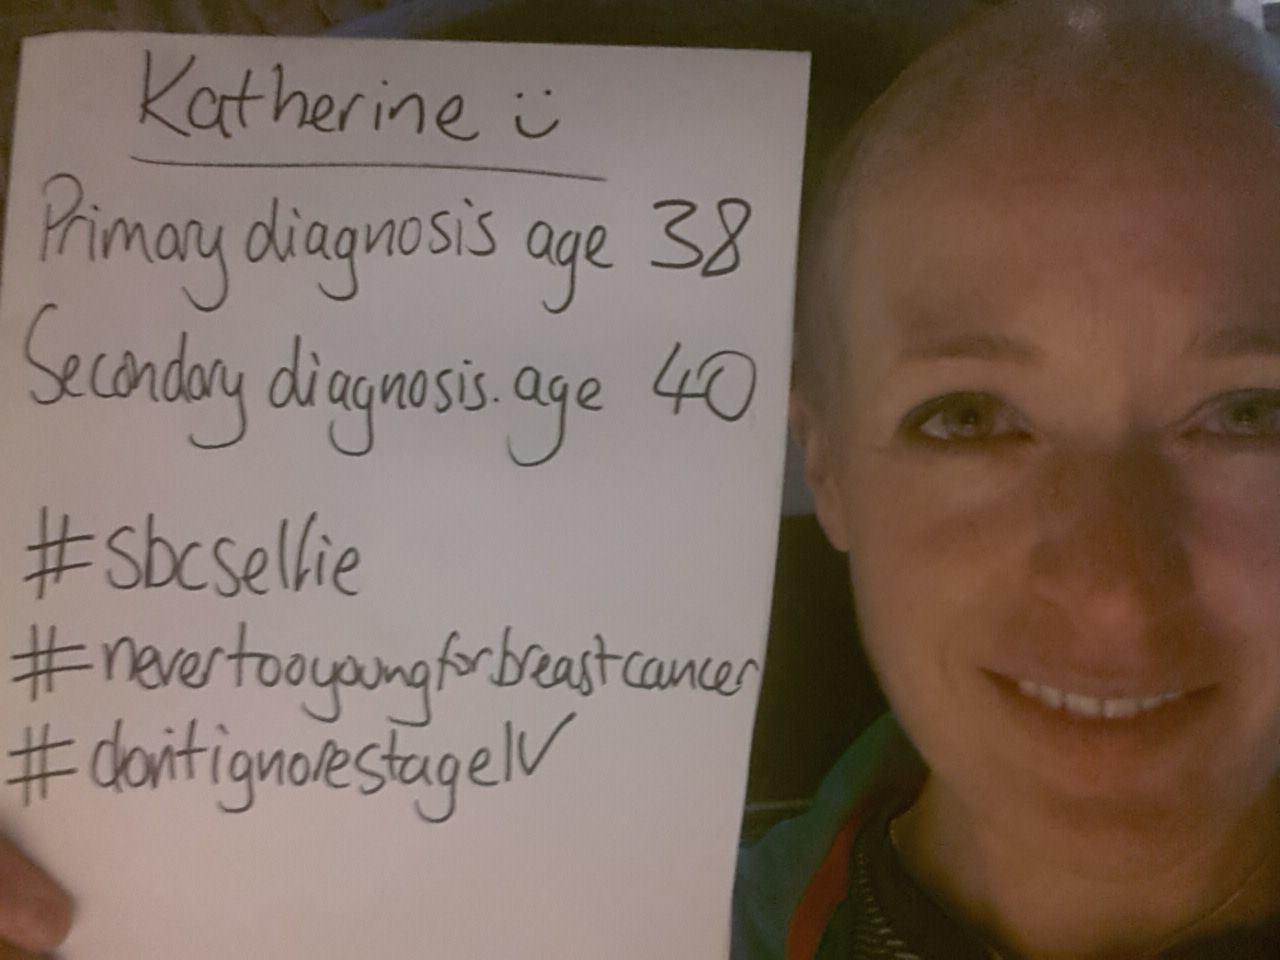 breakthrough breast cancer christmas cards 2012 calendar